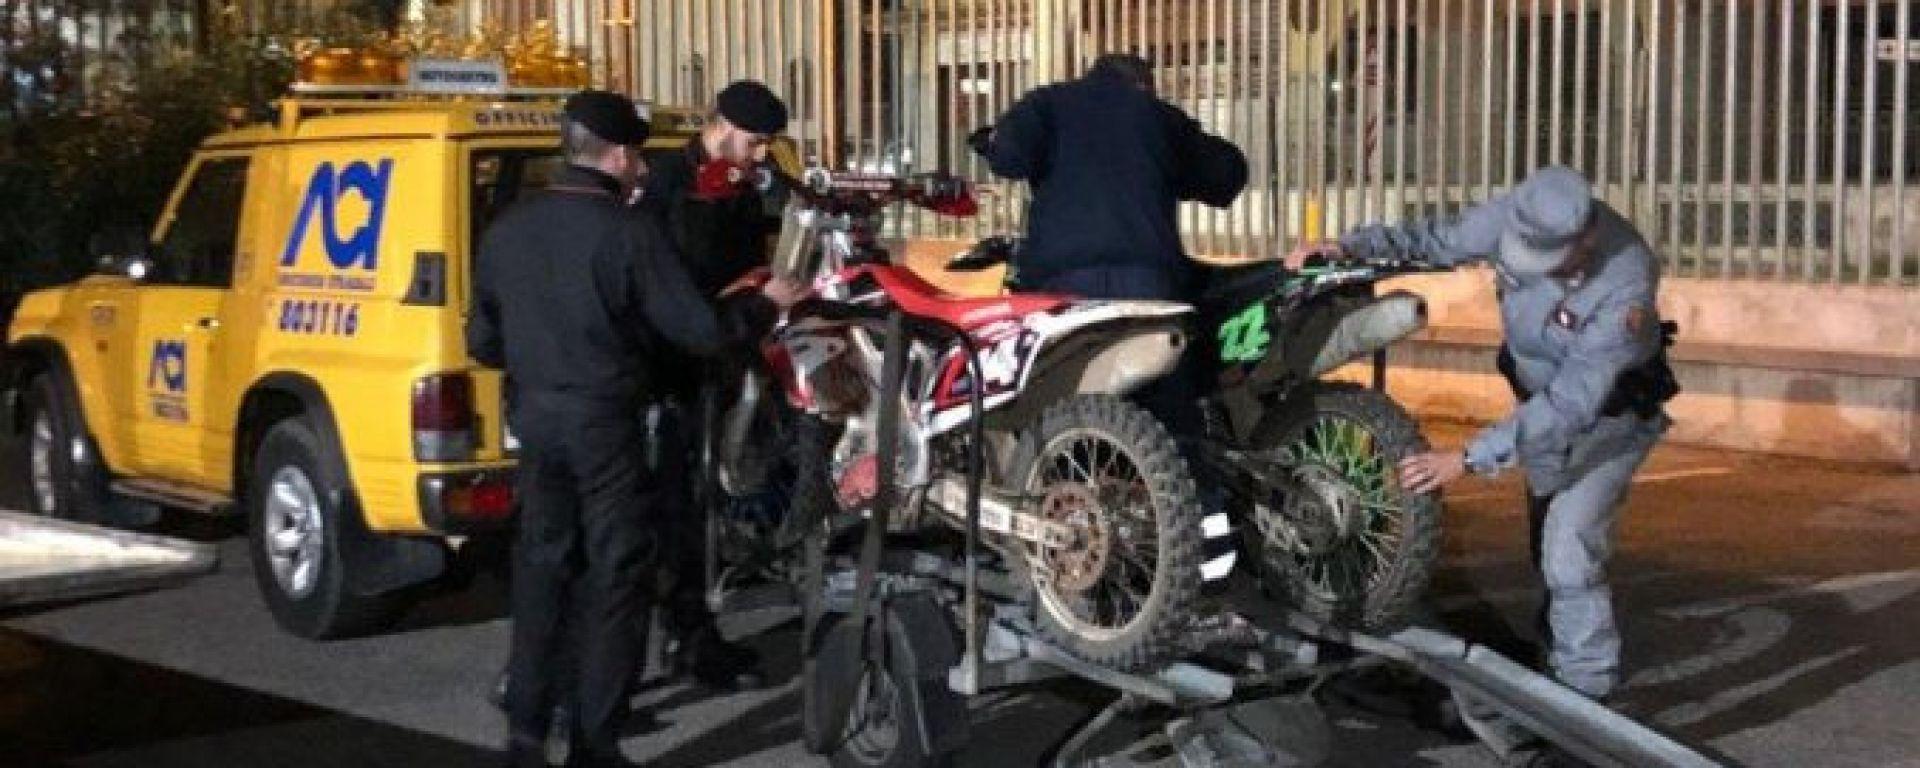 Guerra al rumore: moto di serie fuorilegge in Tirolo. I paesi a rischio